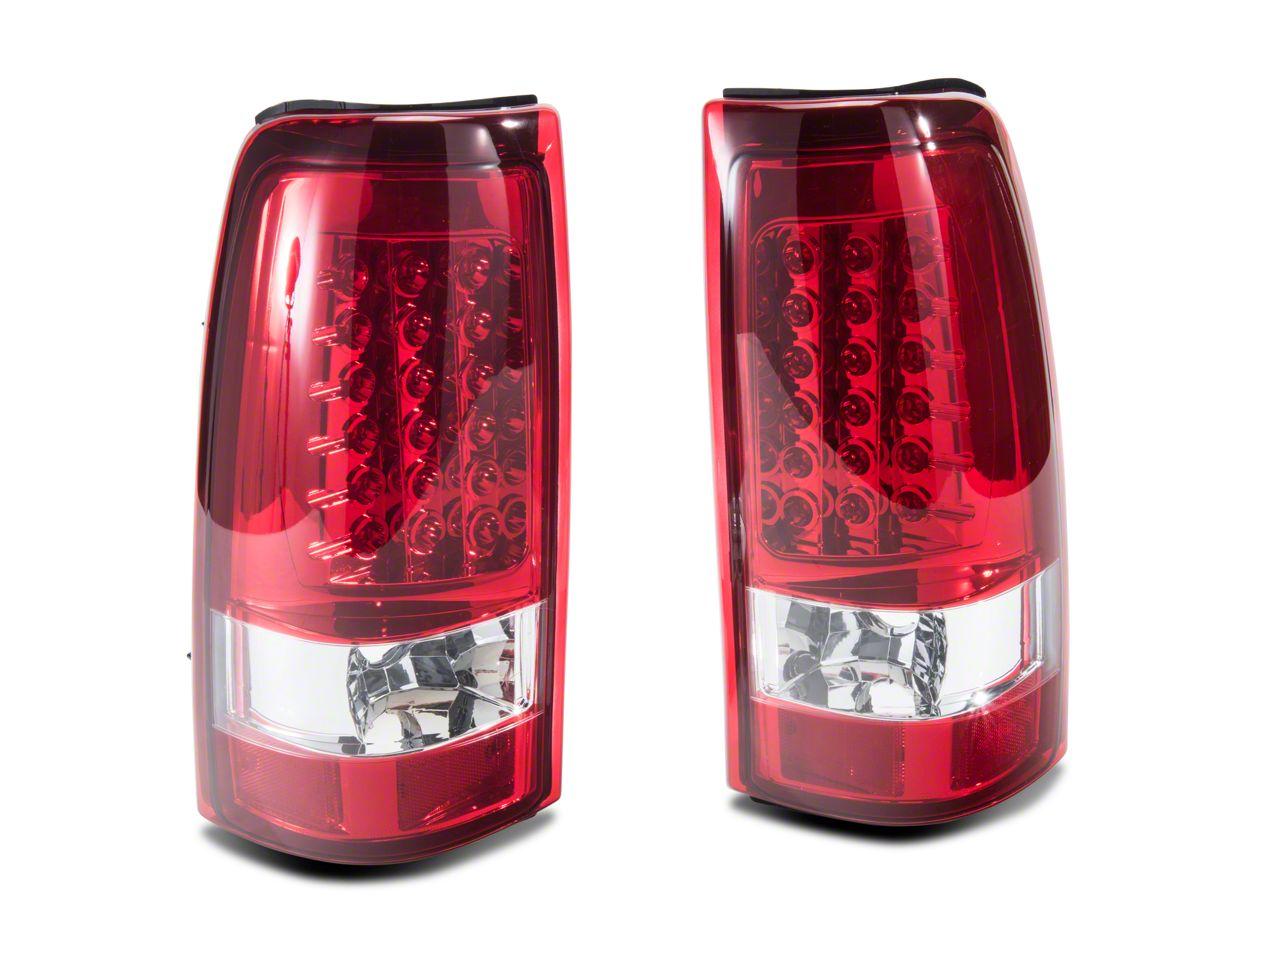 Axial Chrome LED Tail Lights - Red Lens (03-06 Silverado 1500 Fleetside)